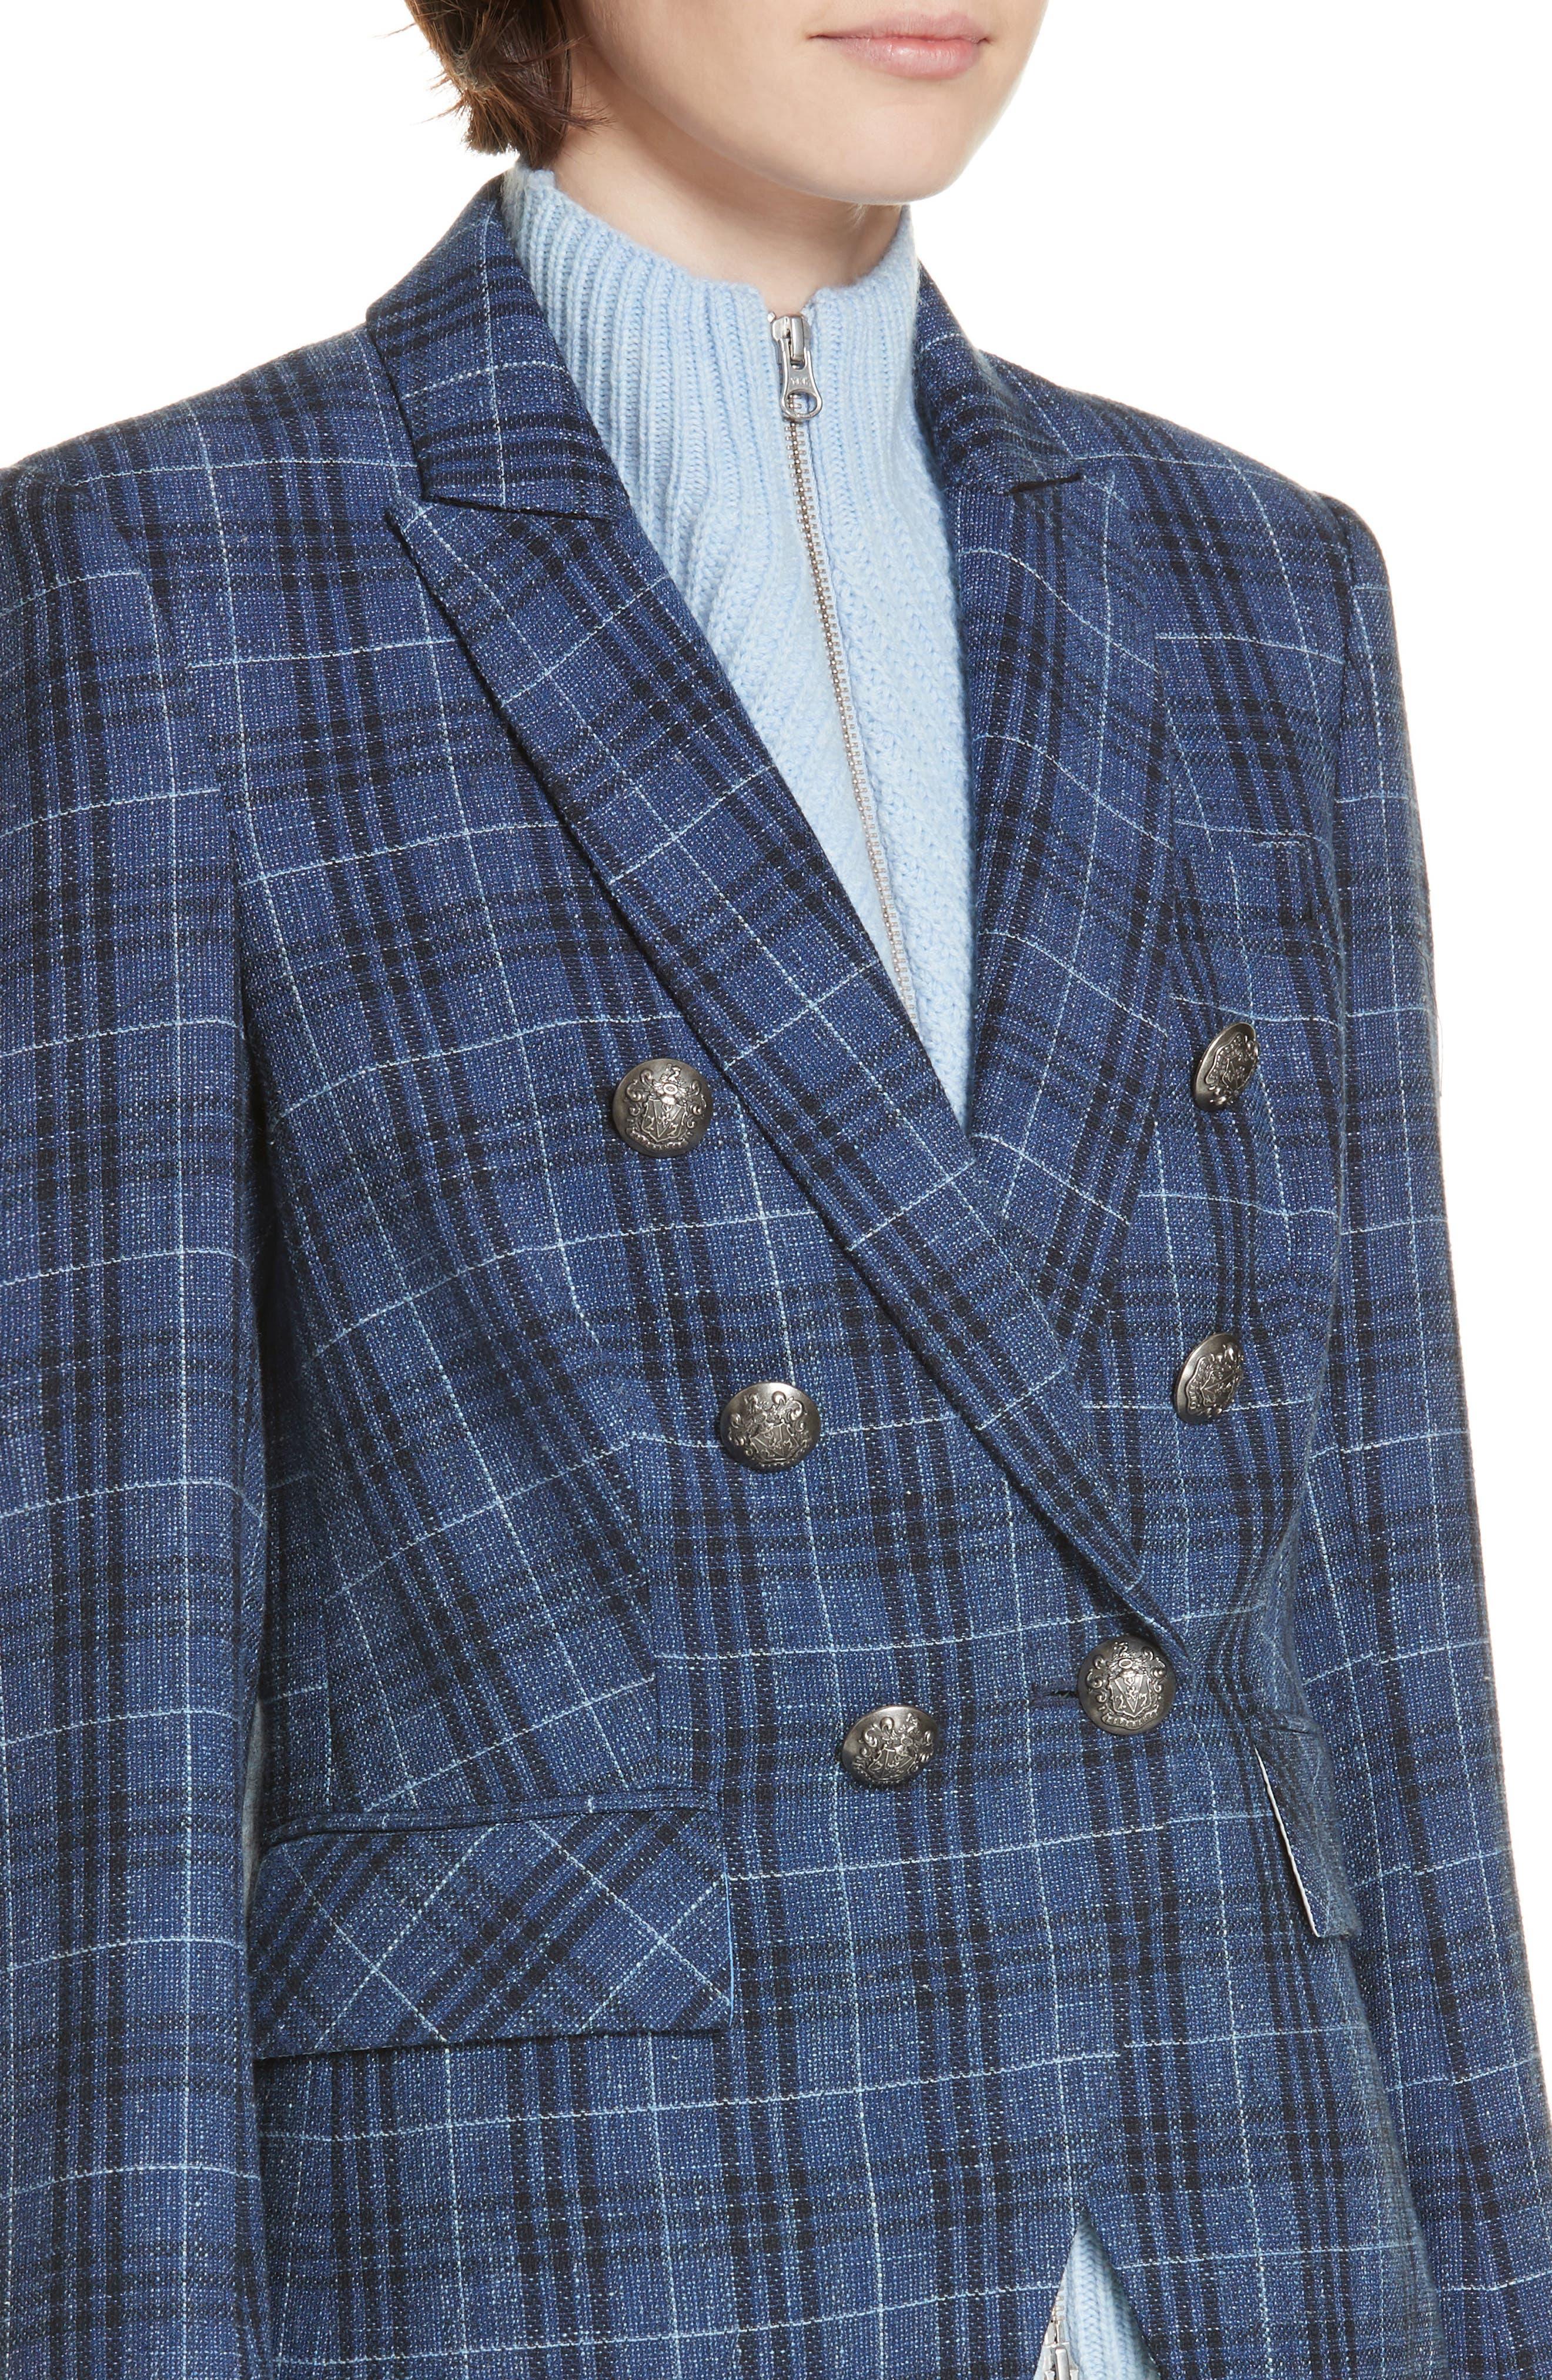 VERONICA BEARD,                             Miller Wool Blend Plaid Dickey Jacket,                             Alternate thumbnail 6, color,                             BLUE